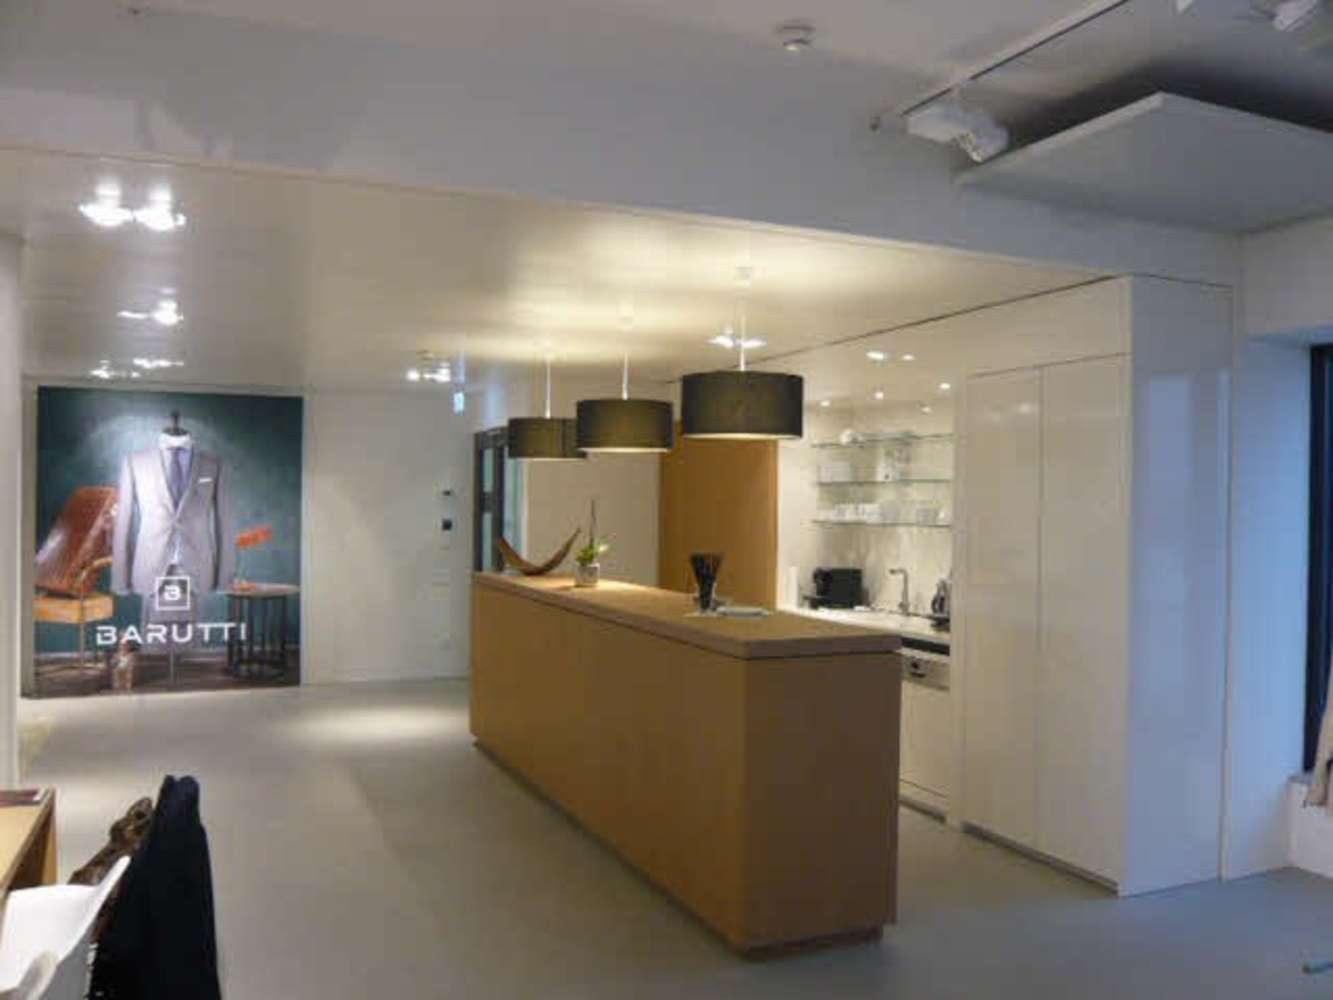 Büros Düsseldorf, 40476 - Büro - Düsseldorf, Derendorf - D1420 - 9406355